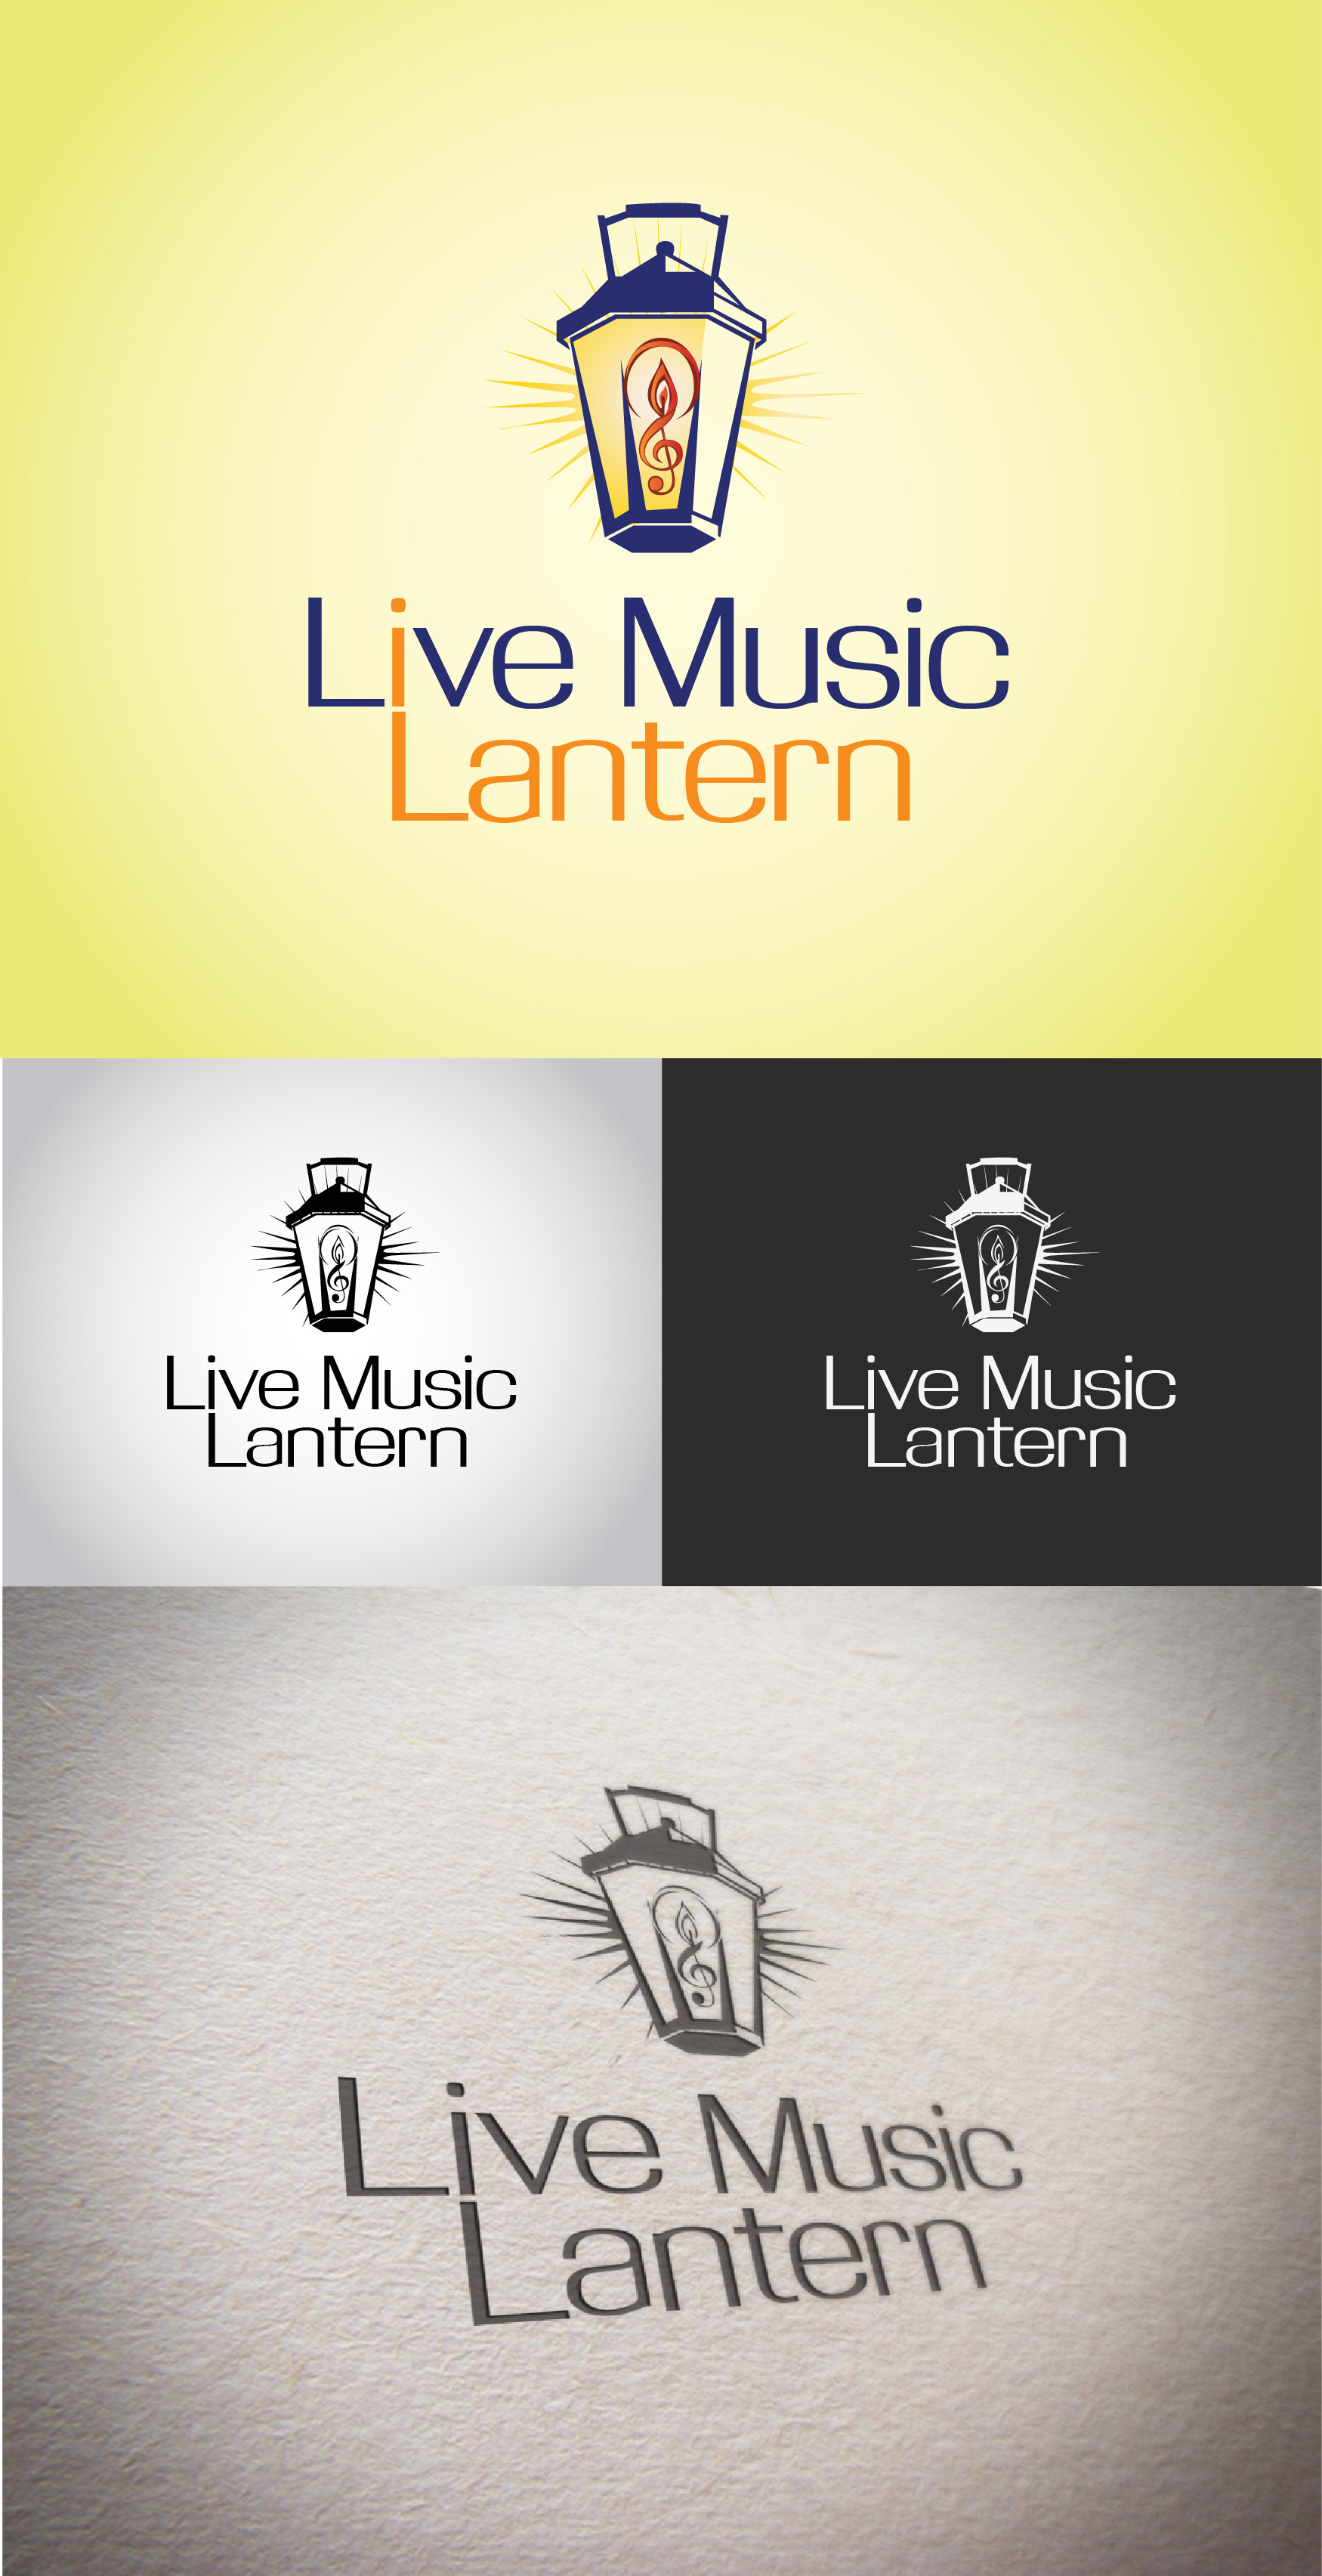 Live Music Lantern